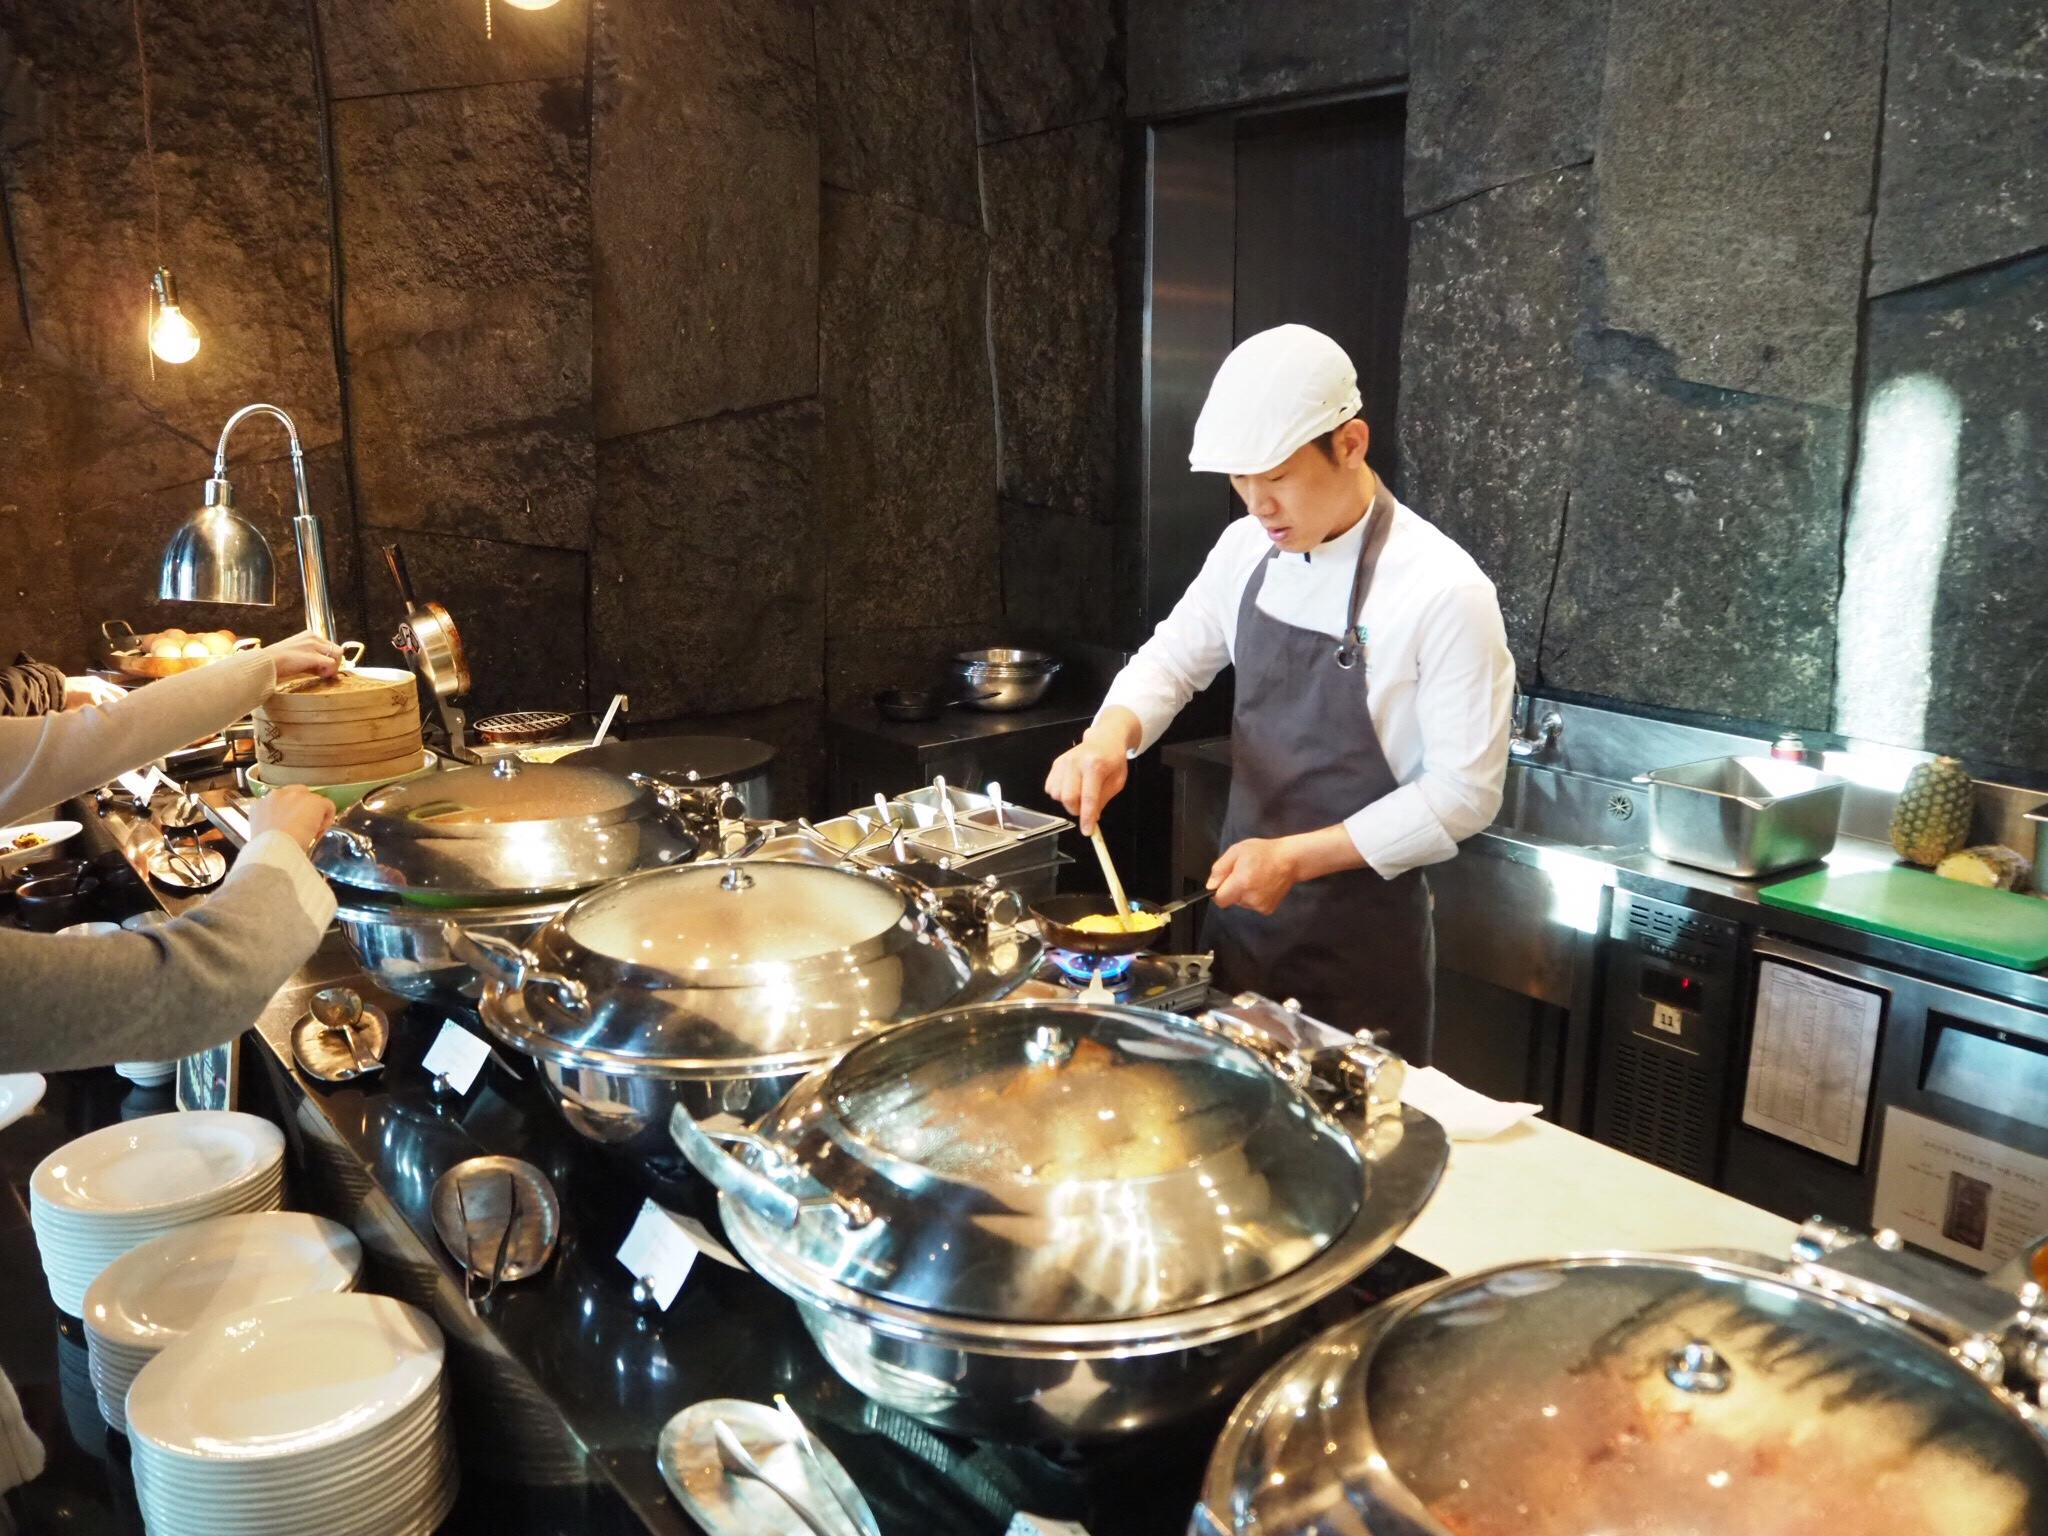 img 8038 - Banyan Tree Club & Spa Seoul - リピーターにお勧めしたい韓国ソウルのちょっと贅沢なステイ先